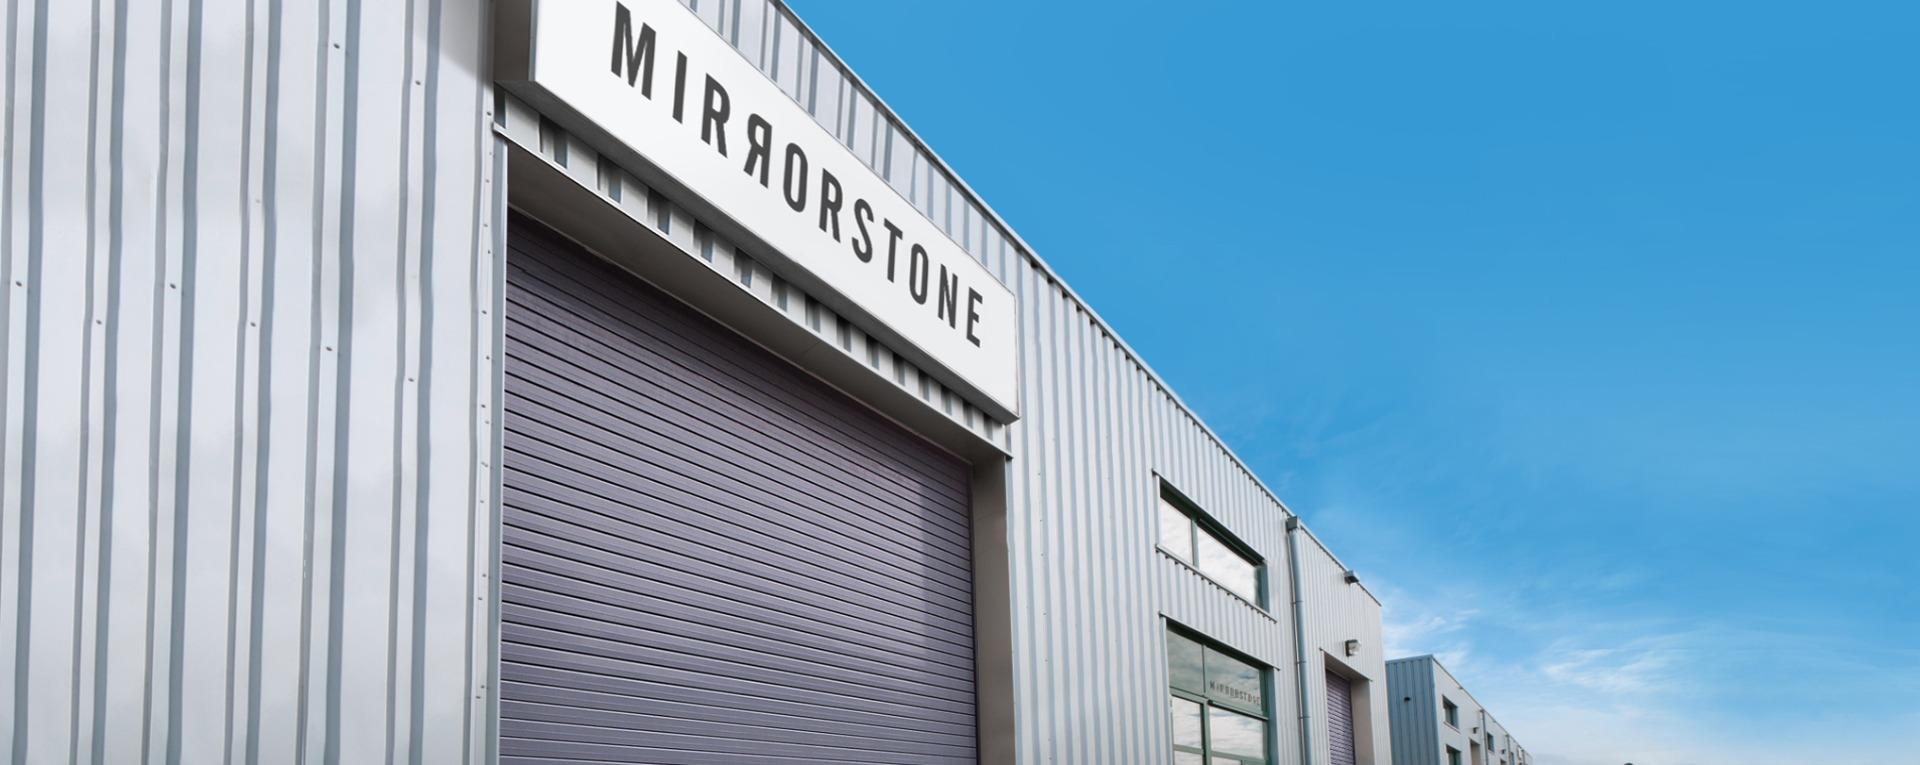 Mirrorstone Warehouse